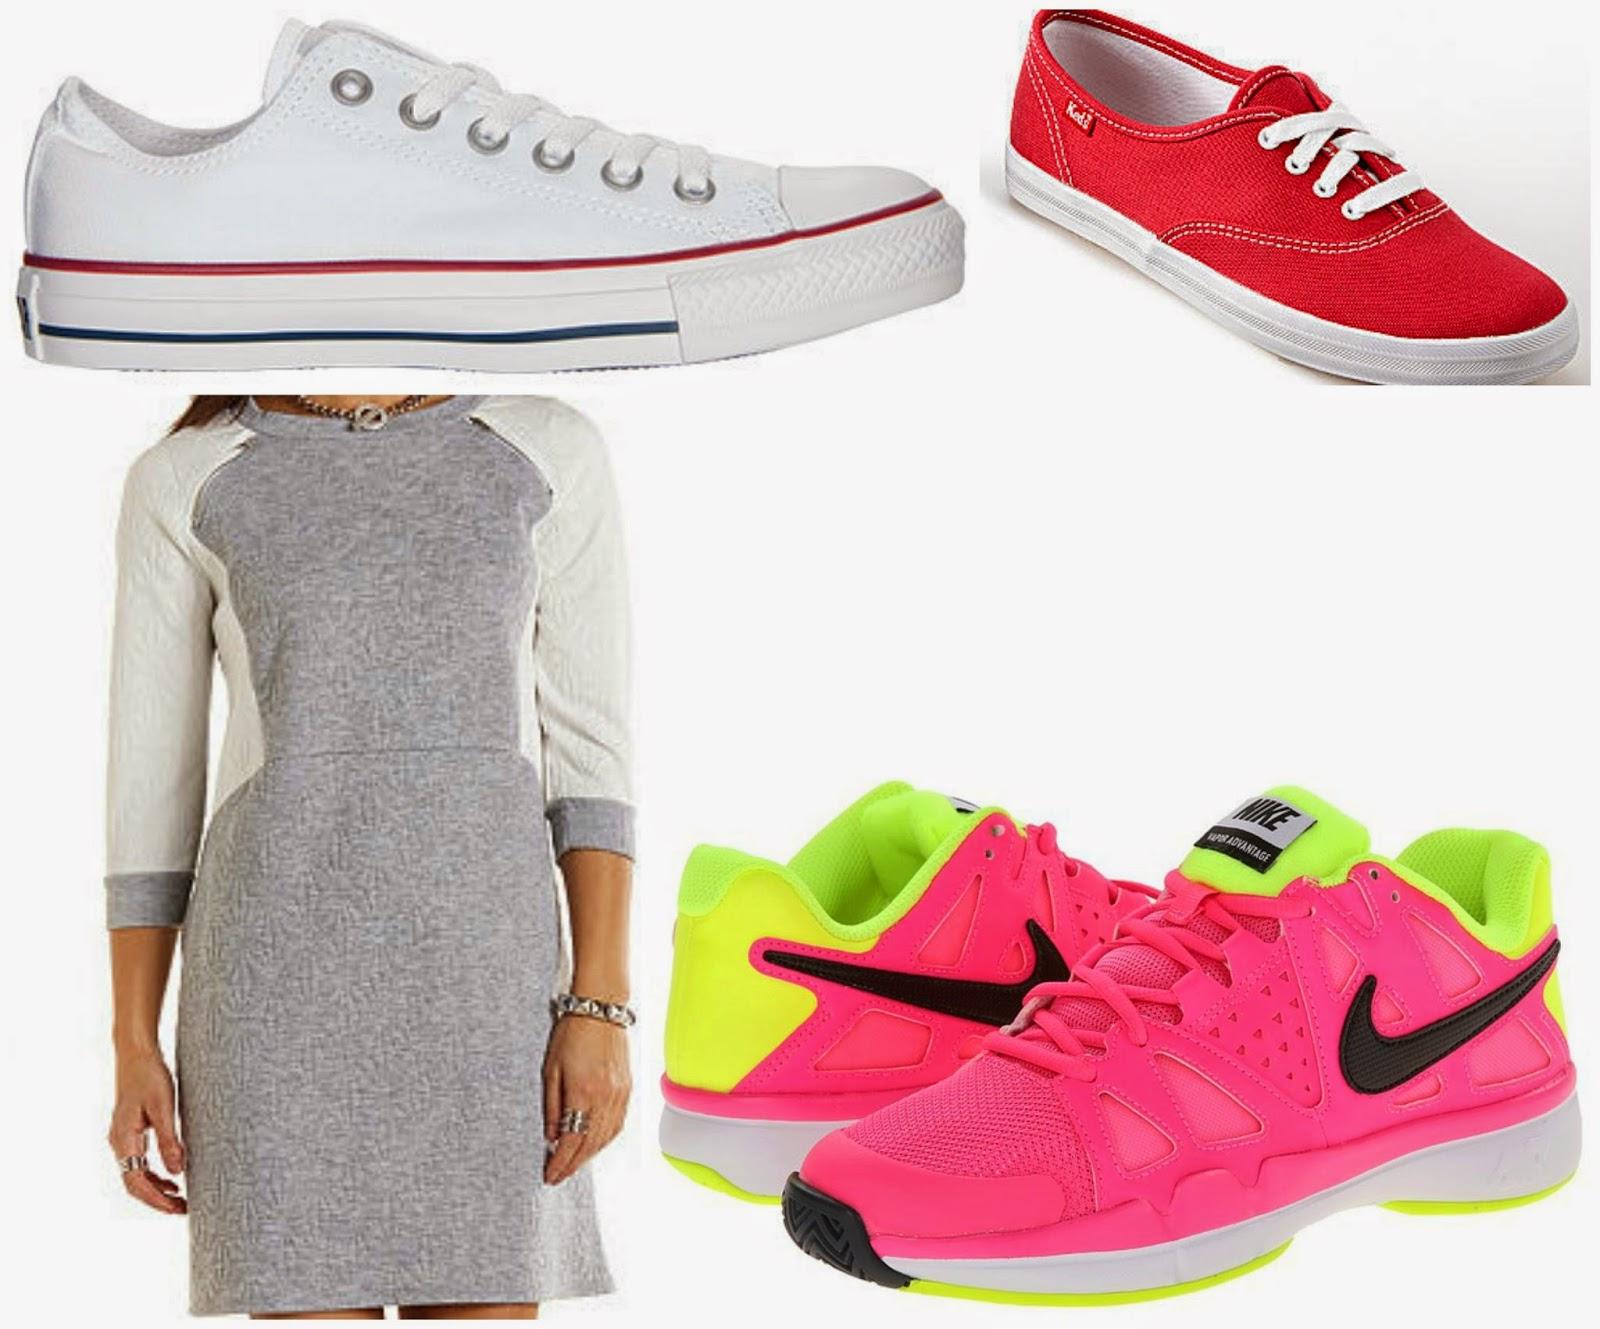 keds converse sweatshirt dress neon tennis shoes